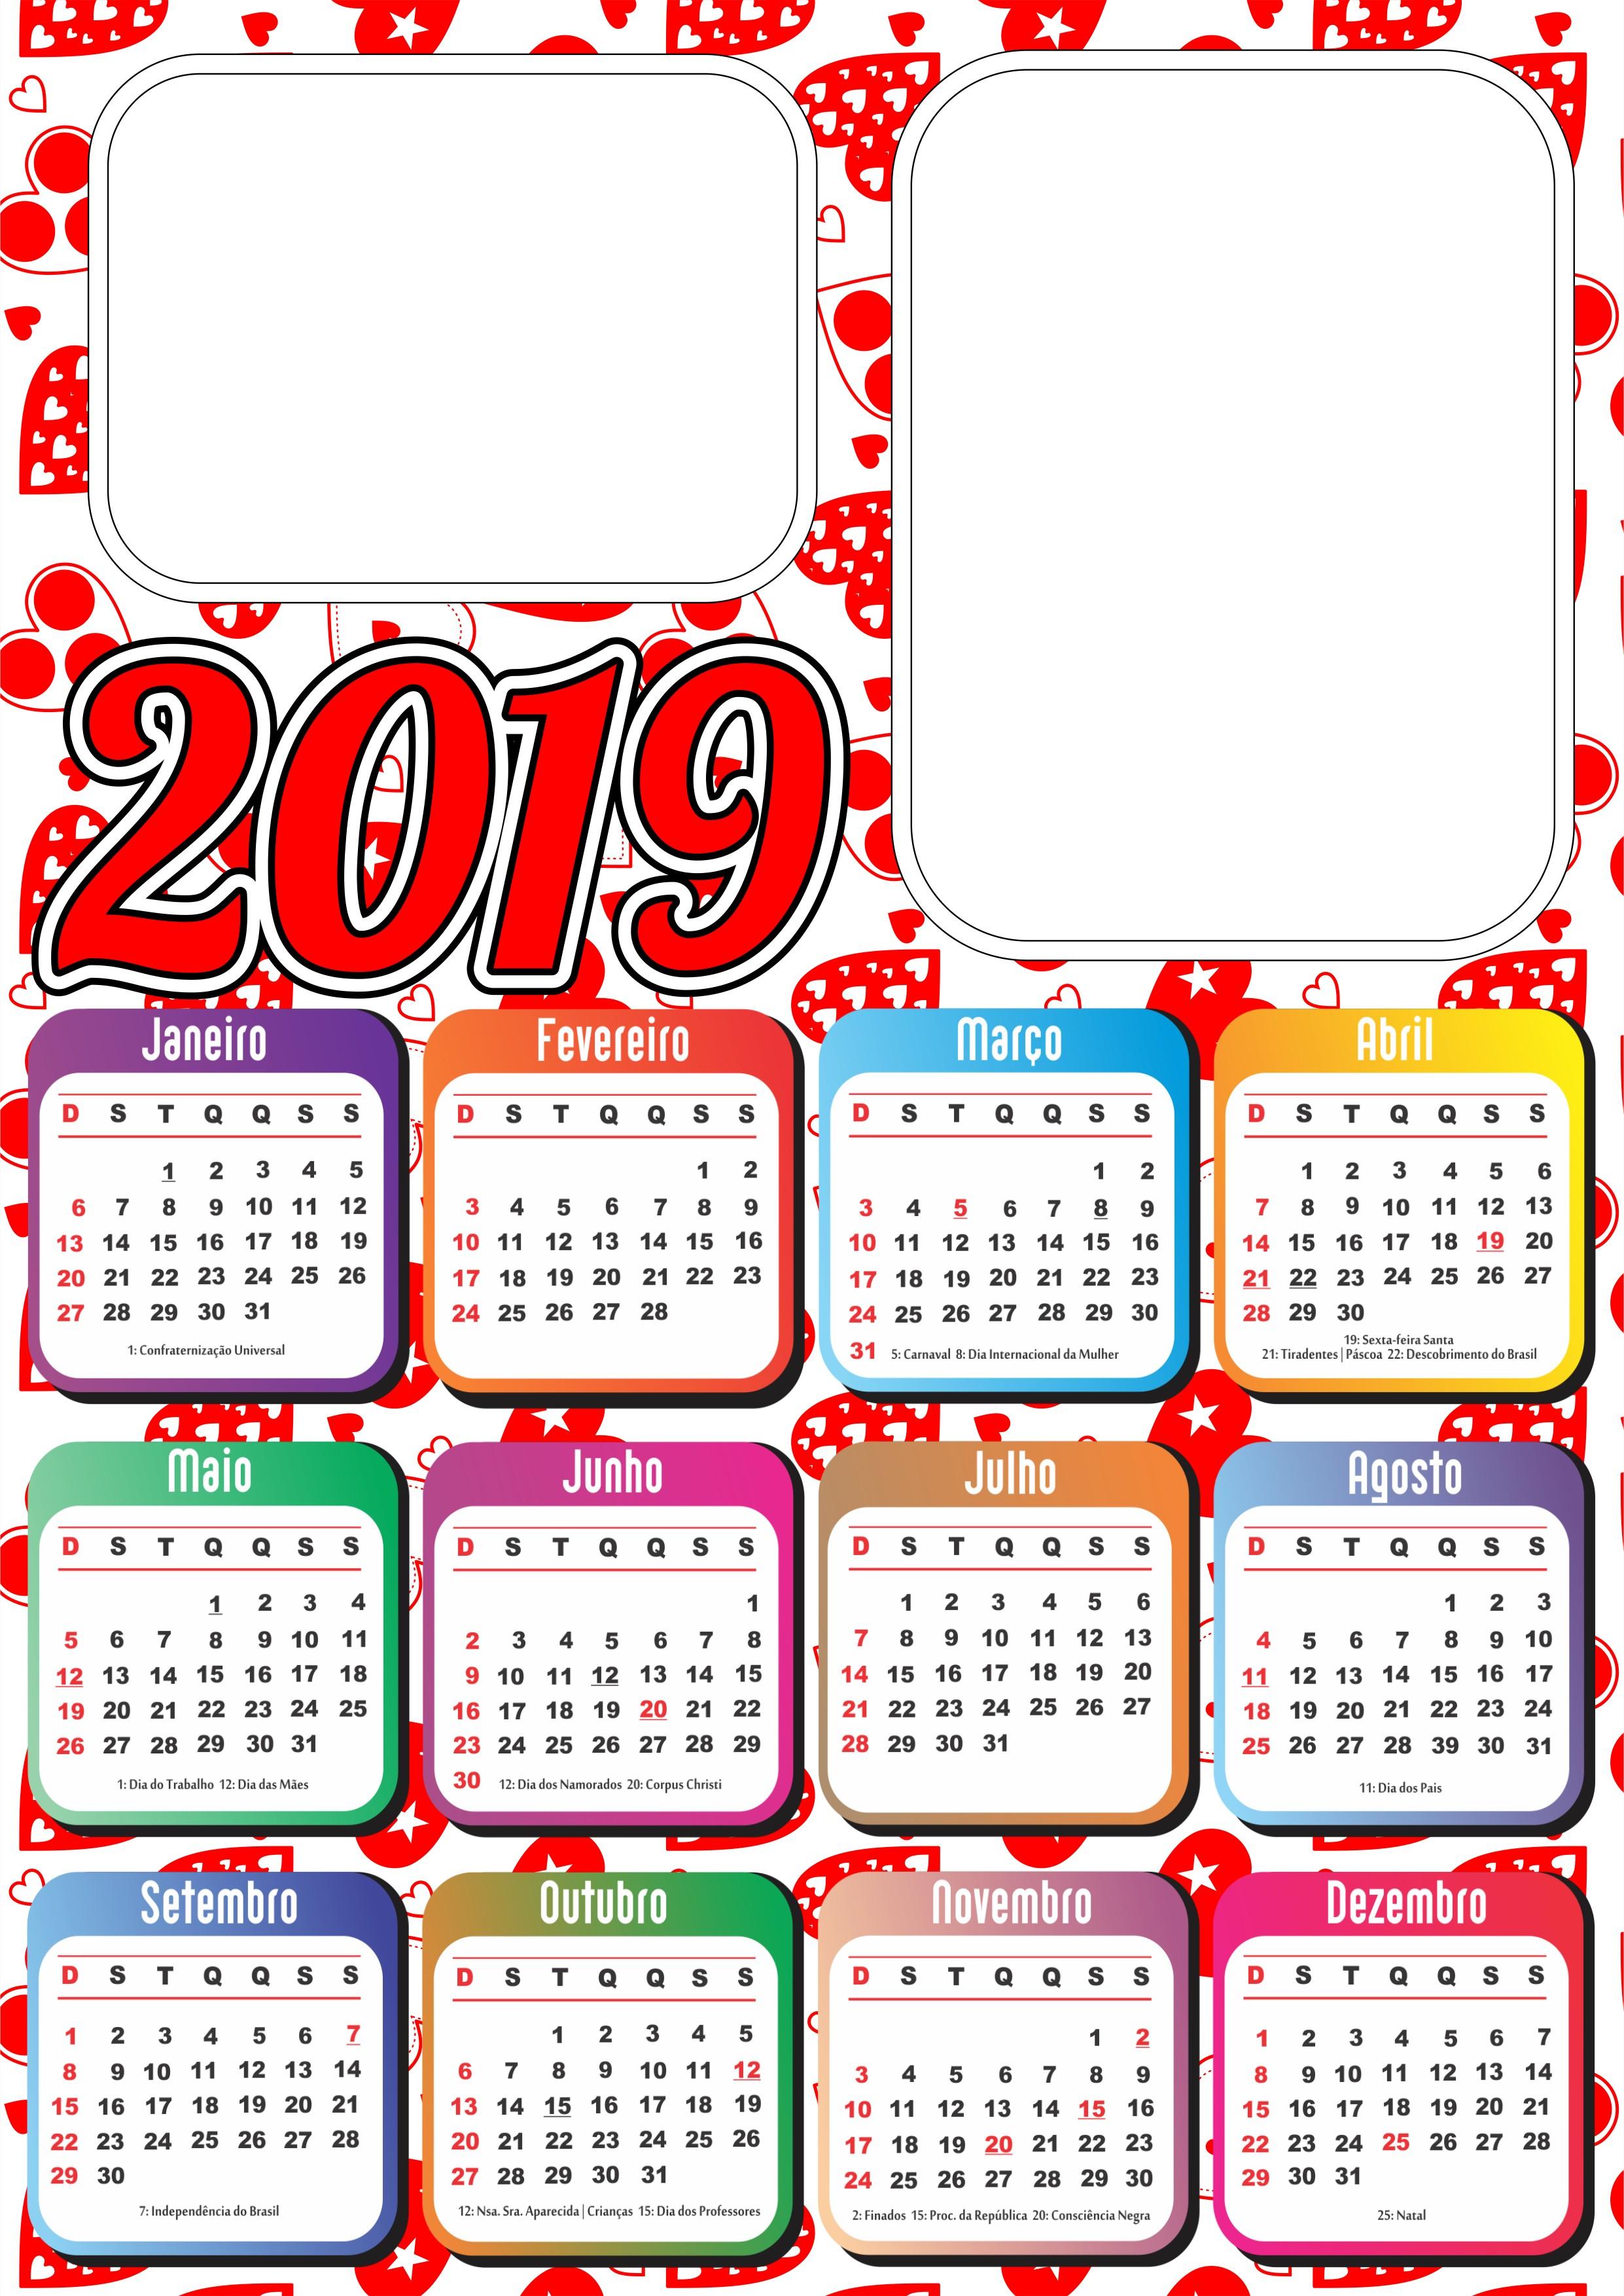 Calendario 2019 Junho Más Recientes Calendário 2019 Calendário 2019 Of Calendario 2019 Junho Más Arriba-a-fecha Index Of Midia